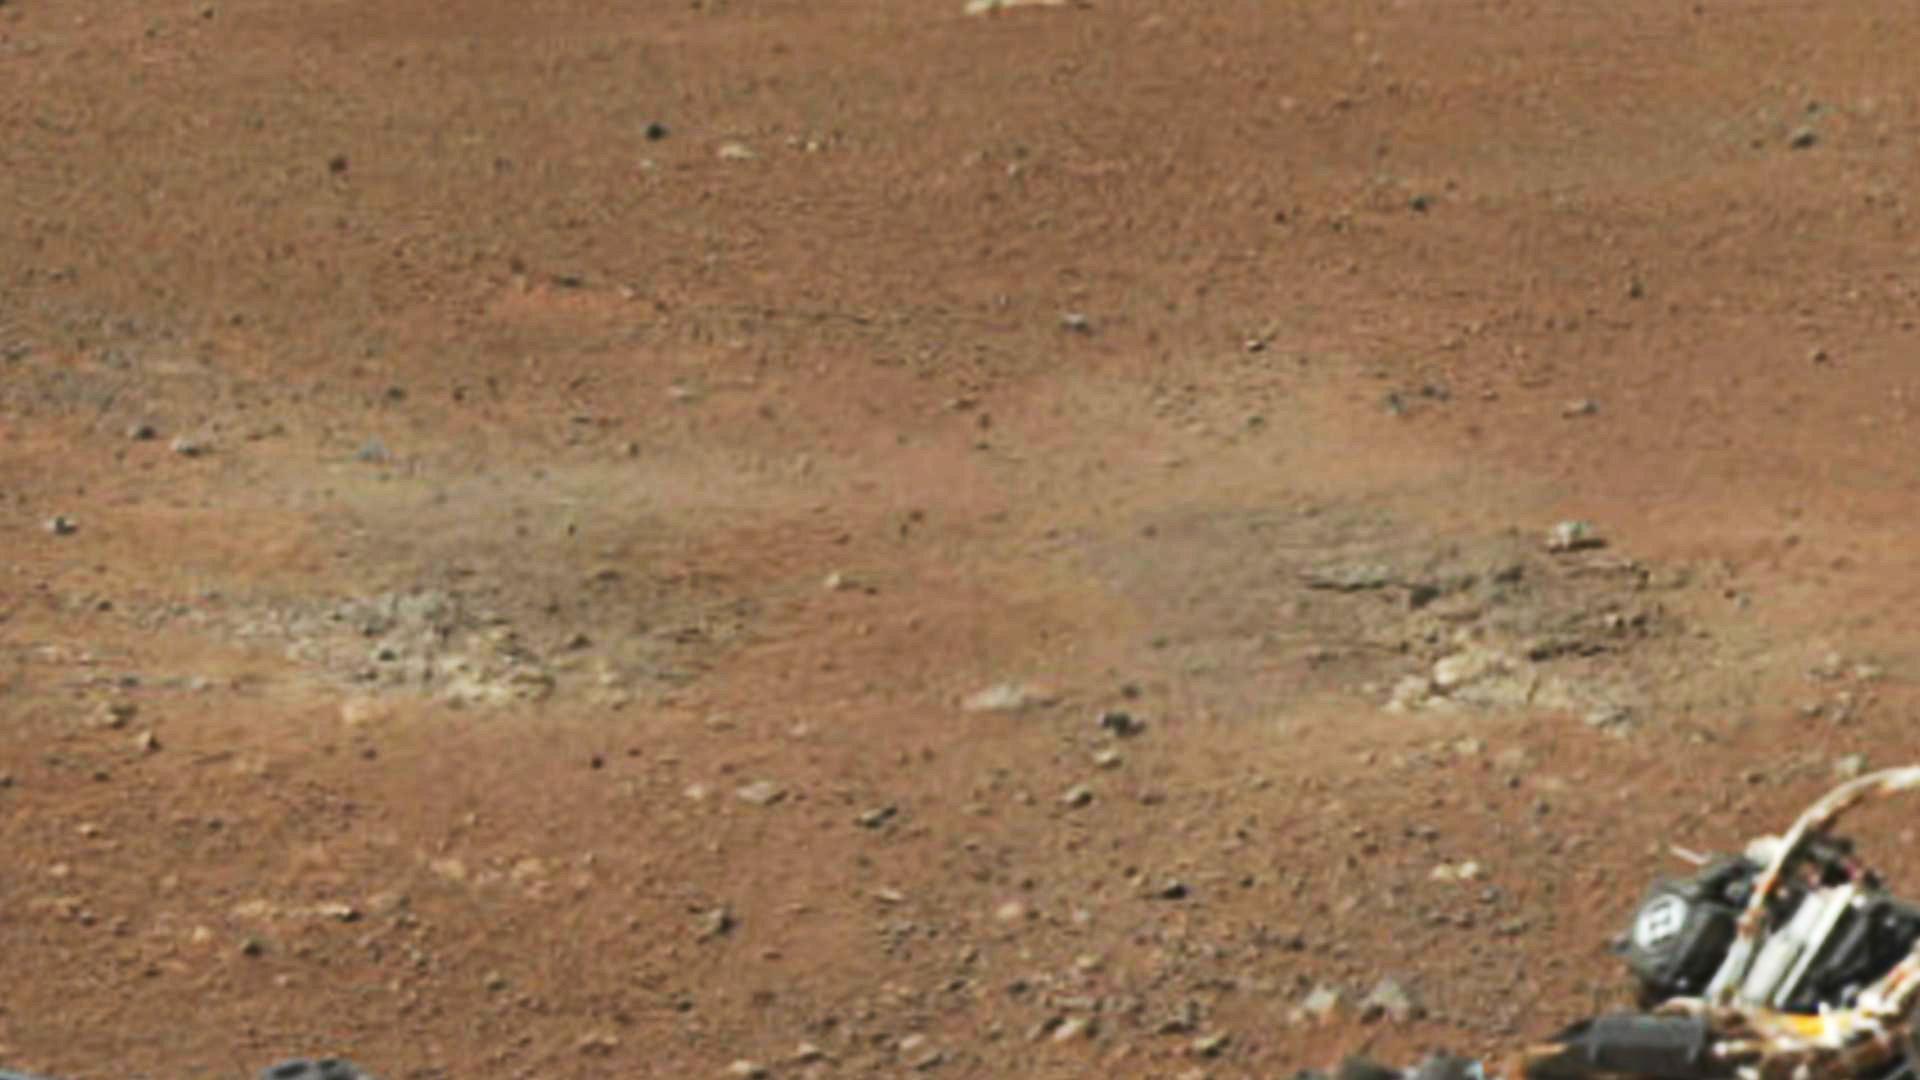 mars surface curiosity panorama - photo #14